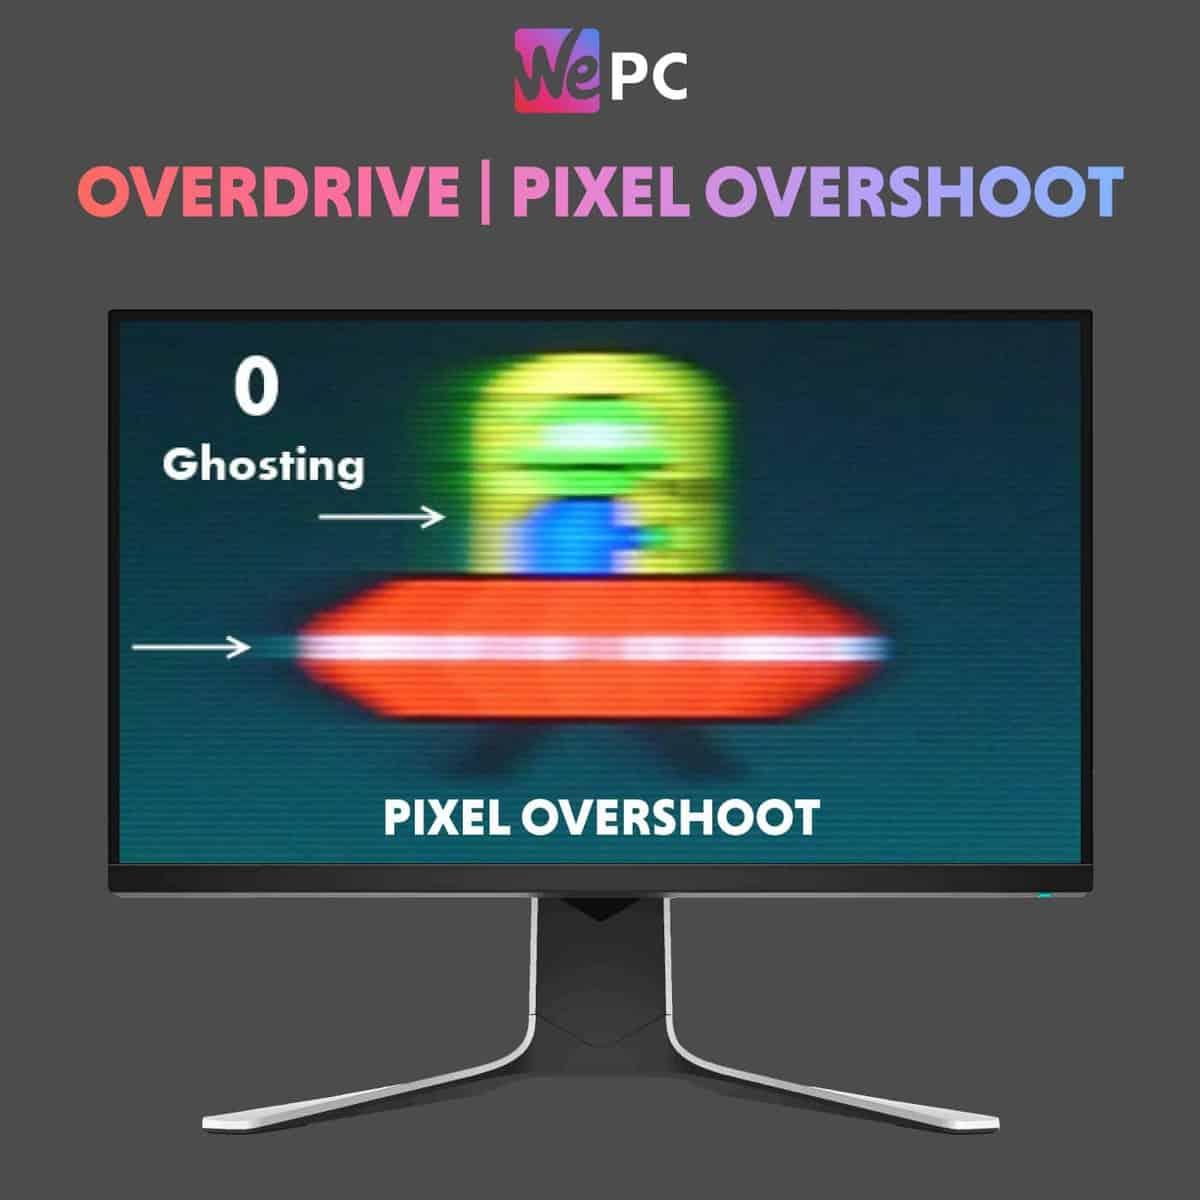 Monitor Overdrive Pixel Overshoot